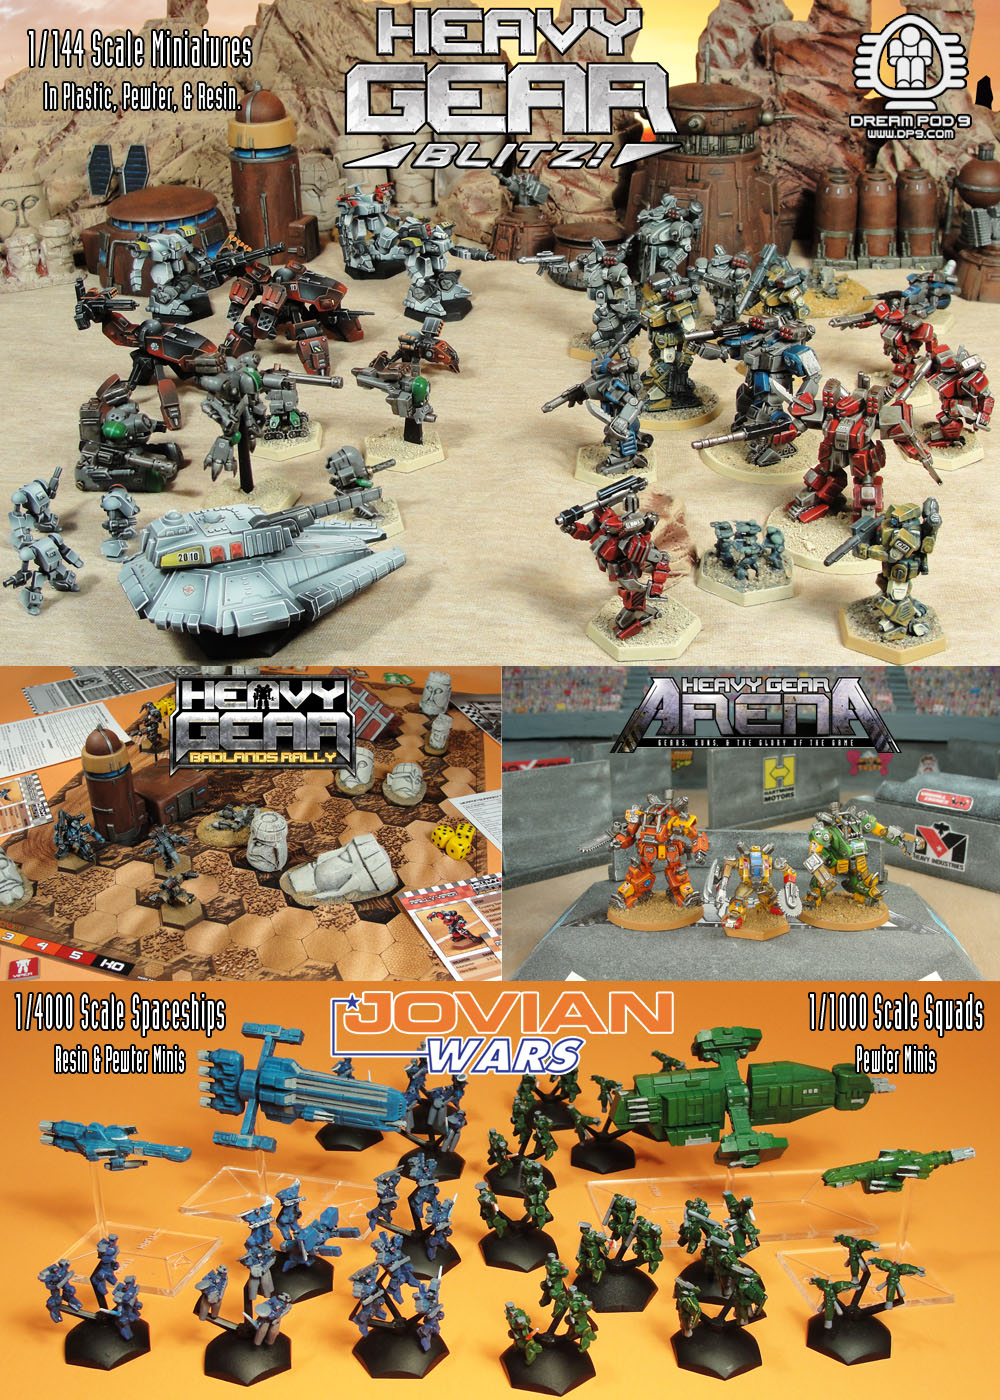 Dream Pod 9 Miniatures Games - Canadian Miniatures Gaming Companies